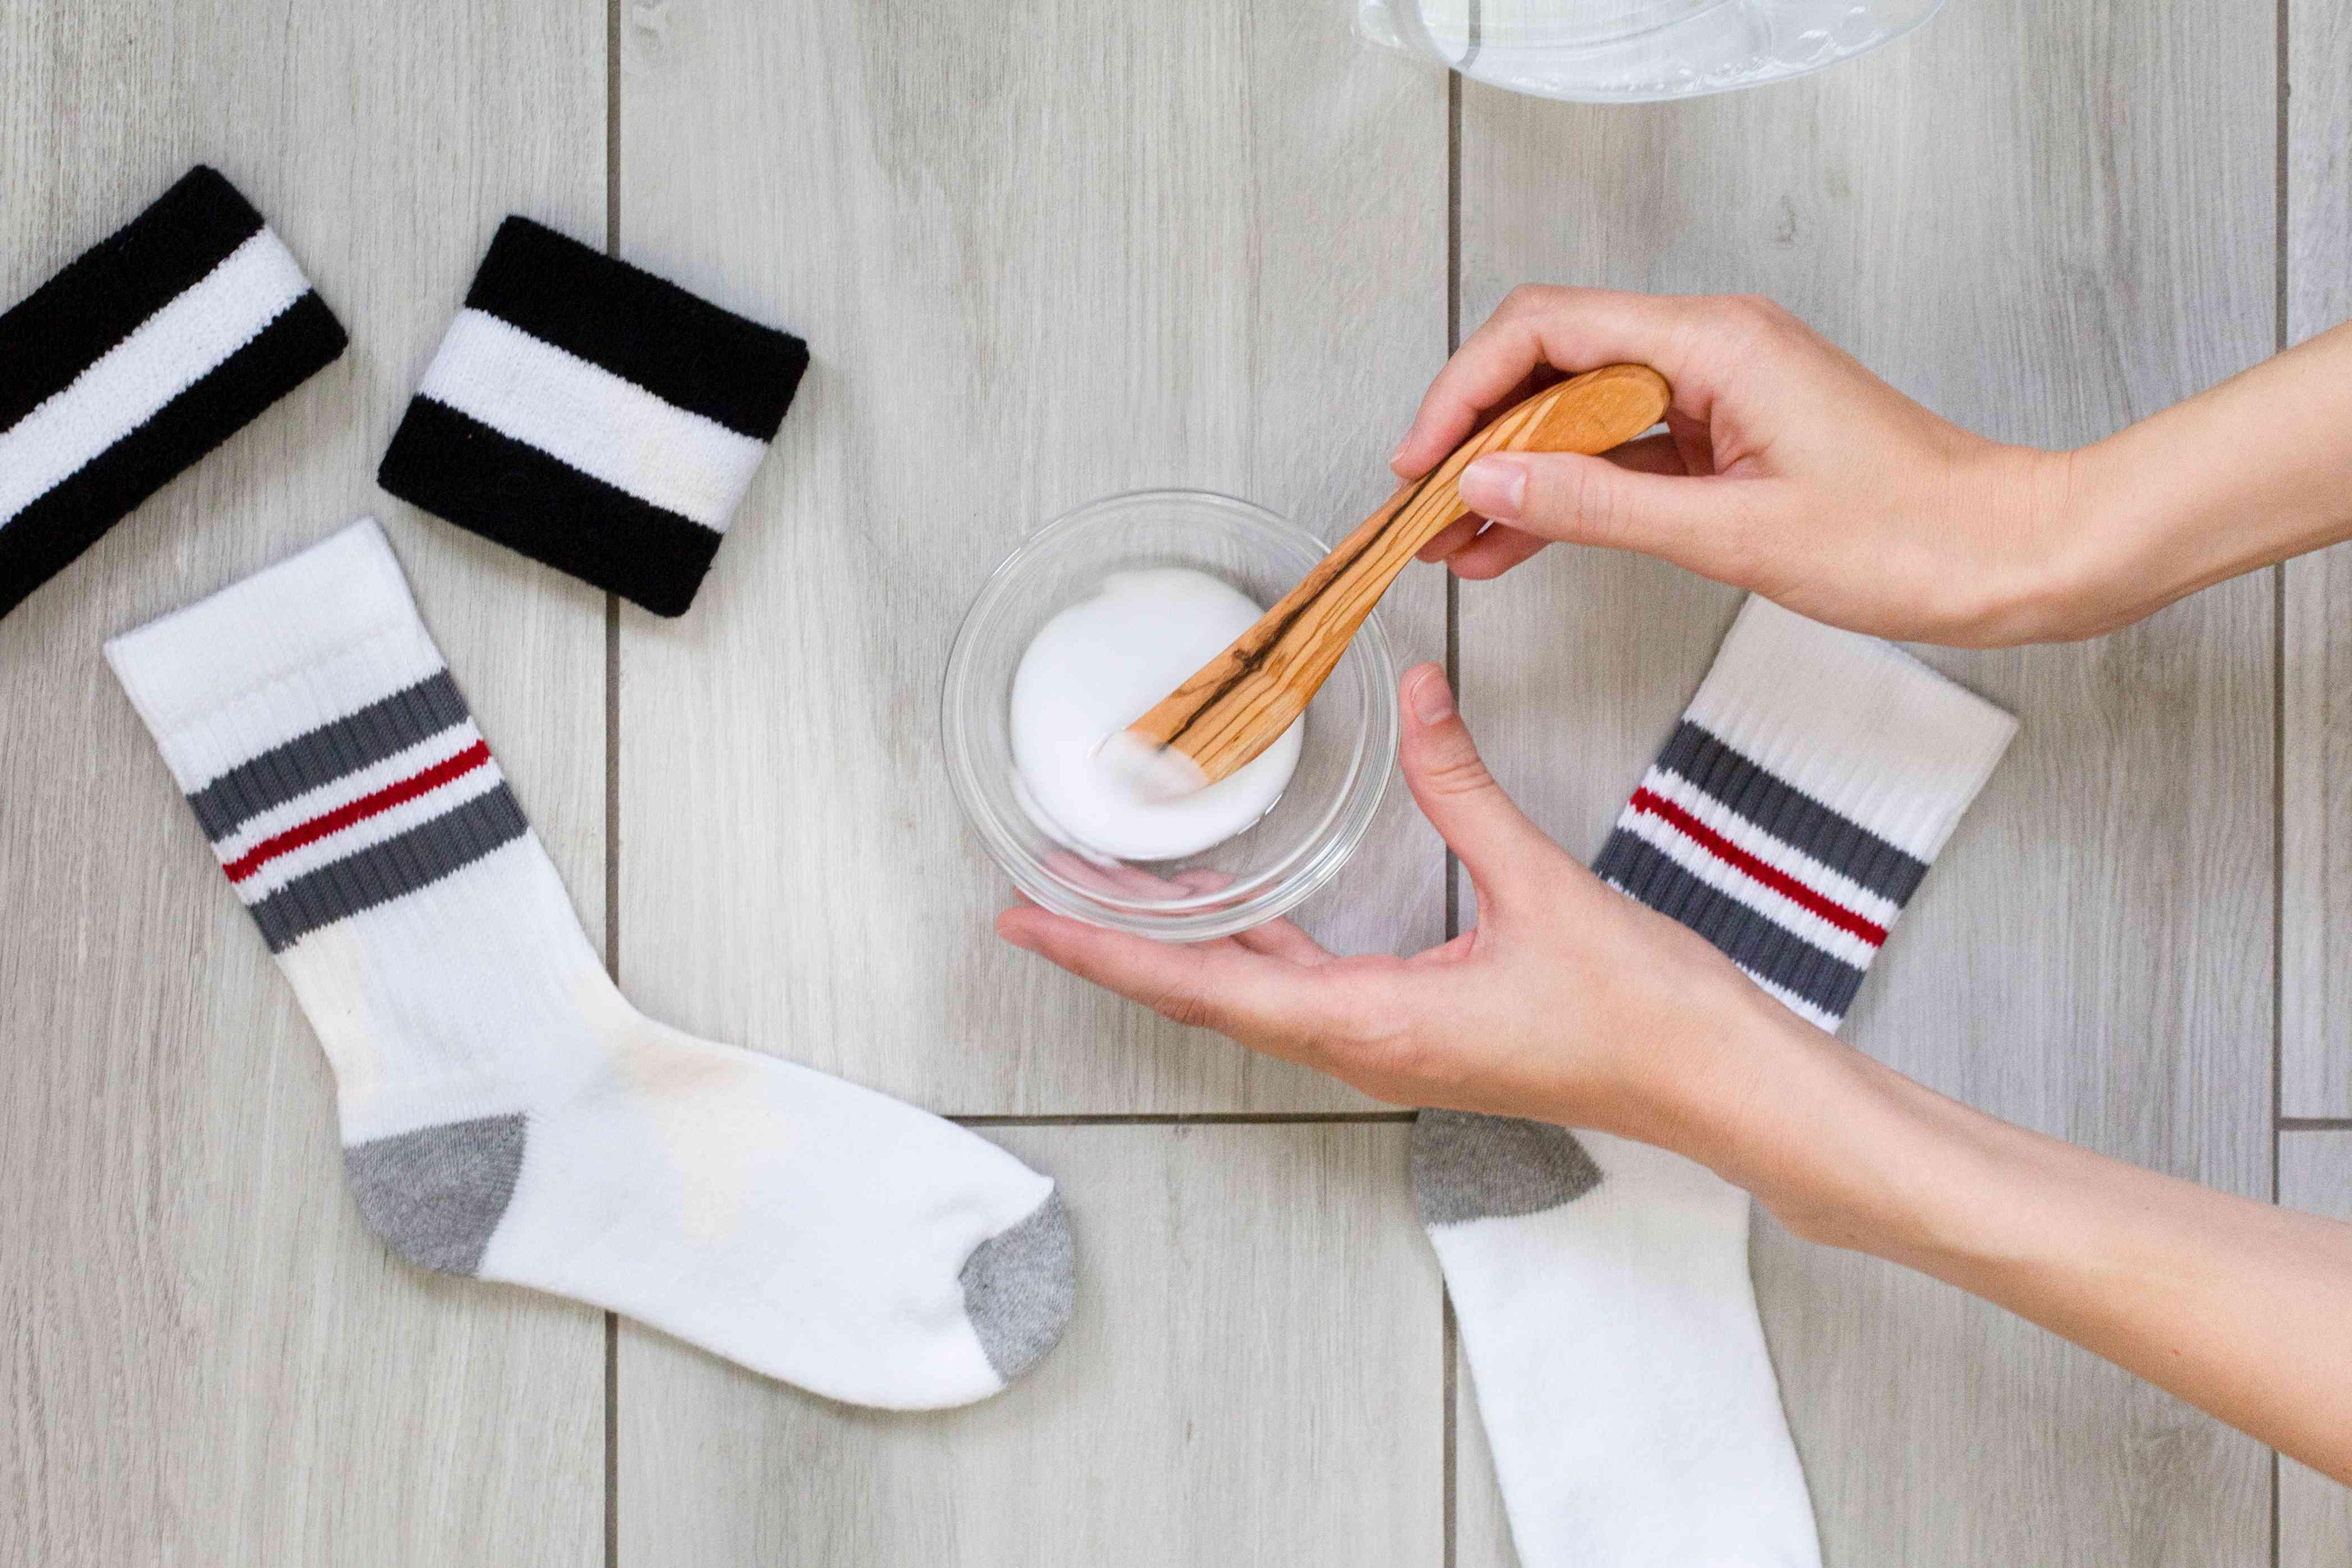 using baking soda to remove odors